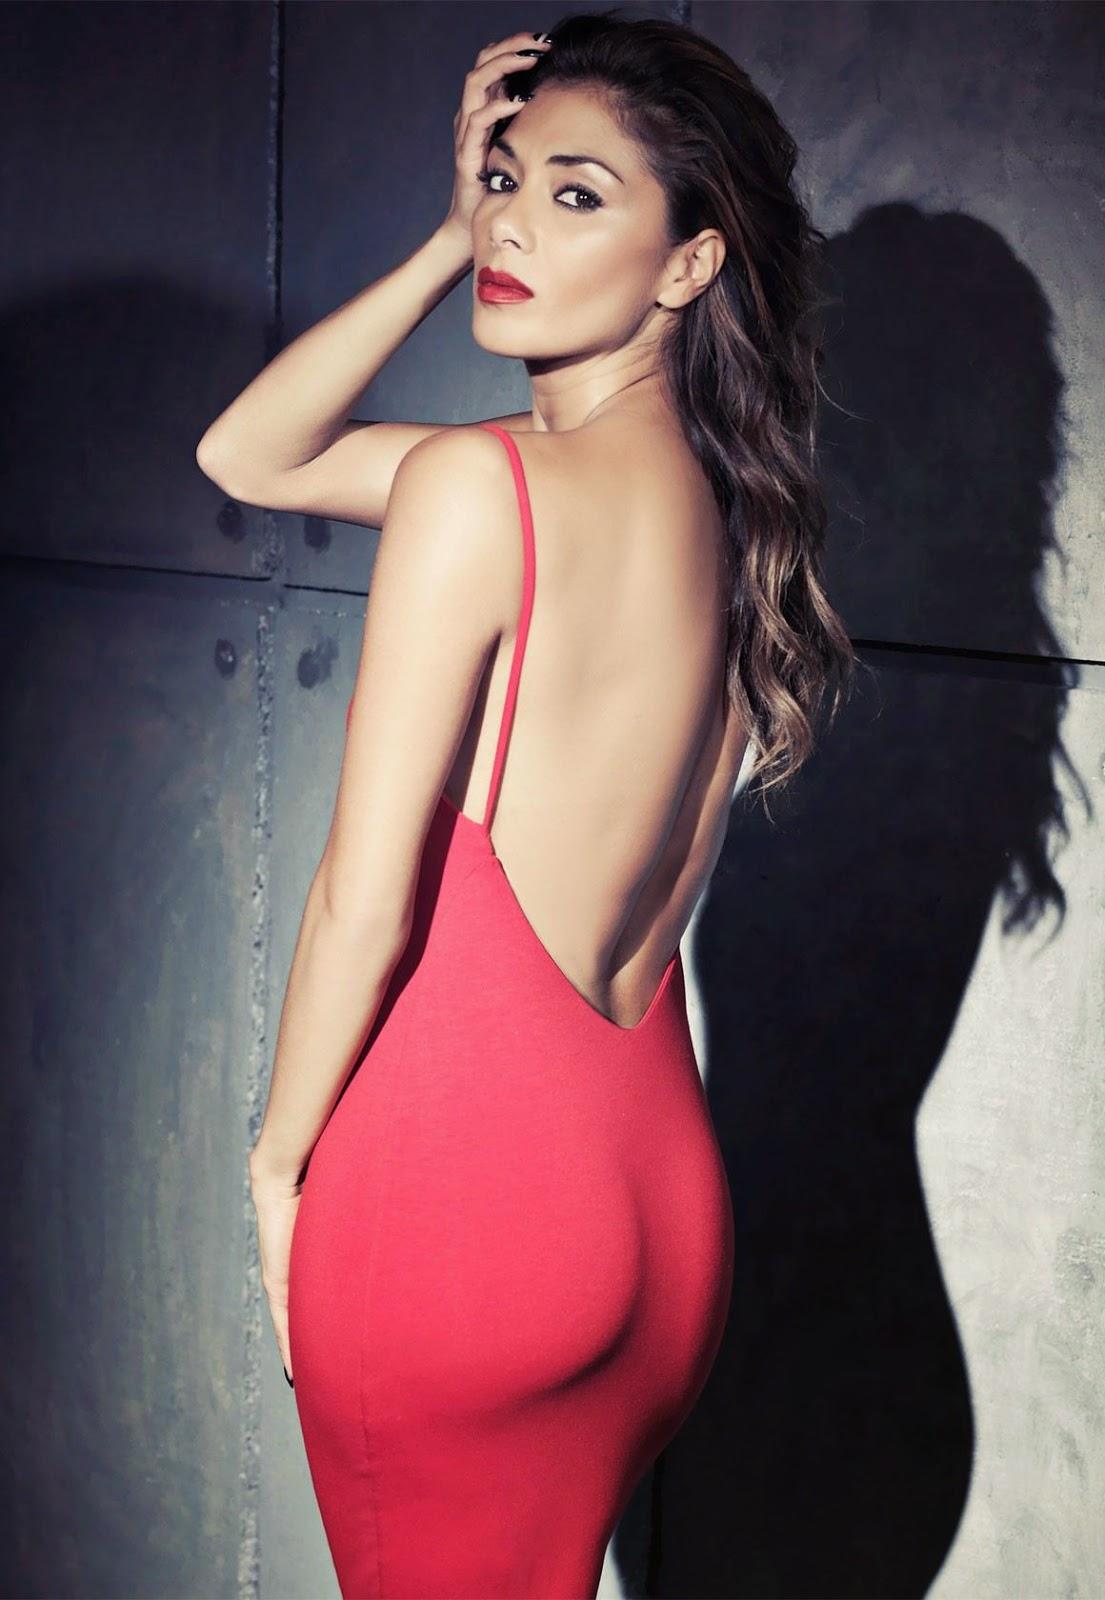 Nicole Scherzinger - Missguided Collection Photoshoot PIC 1